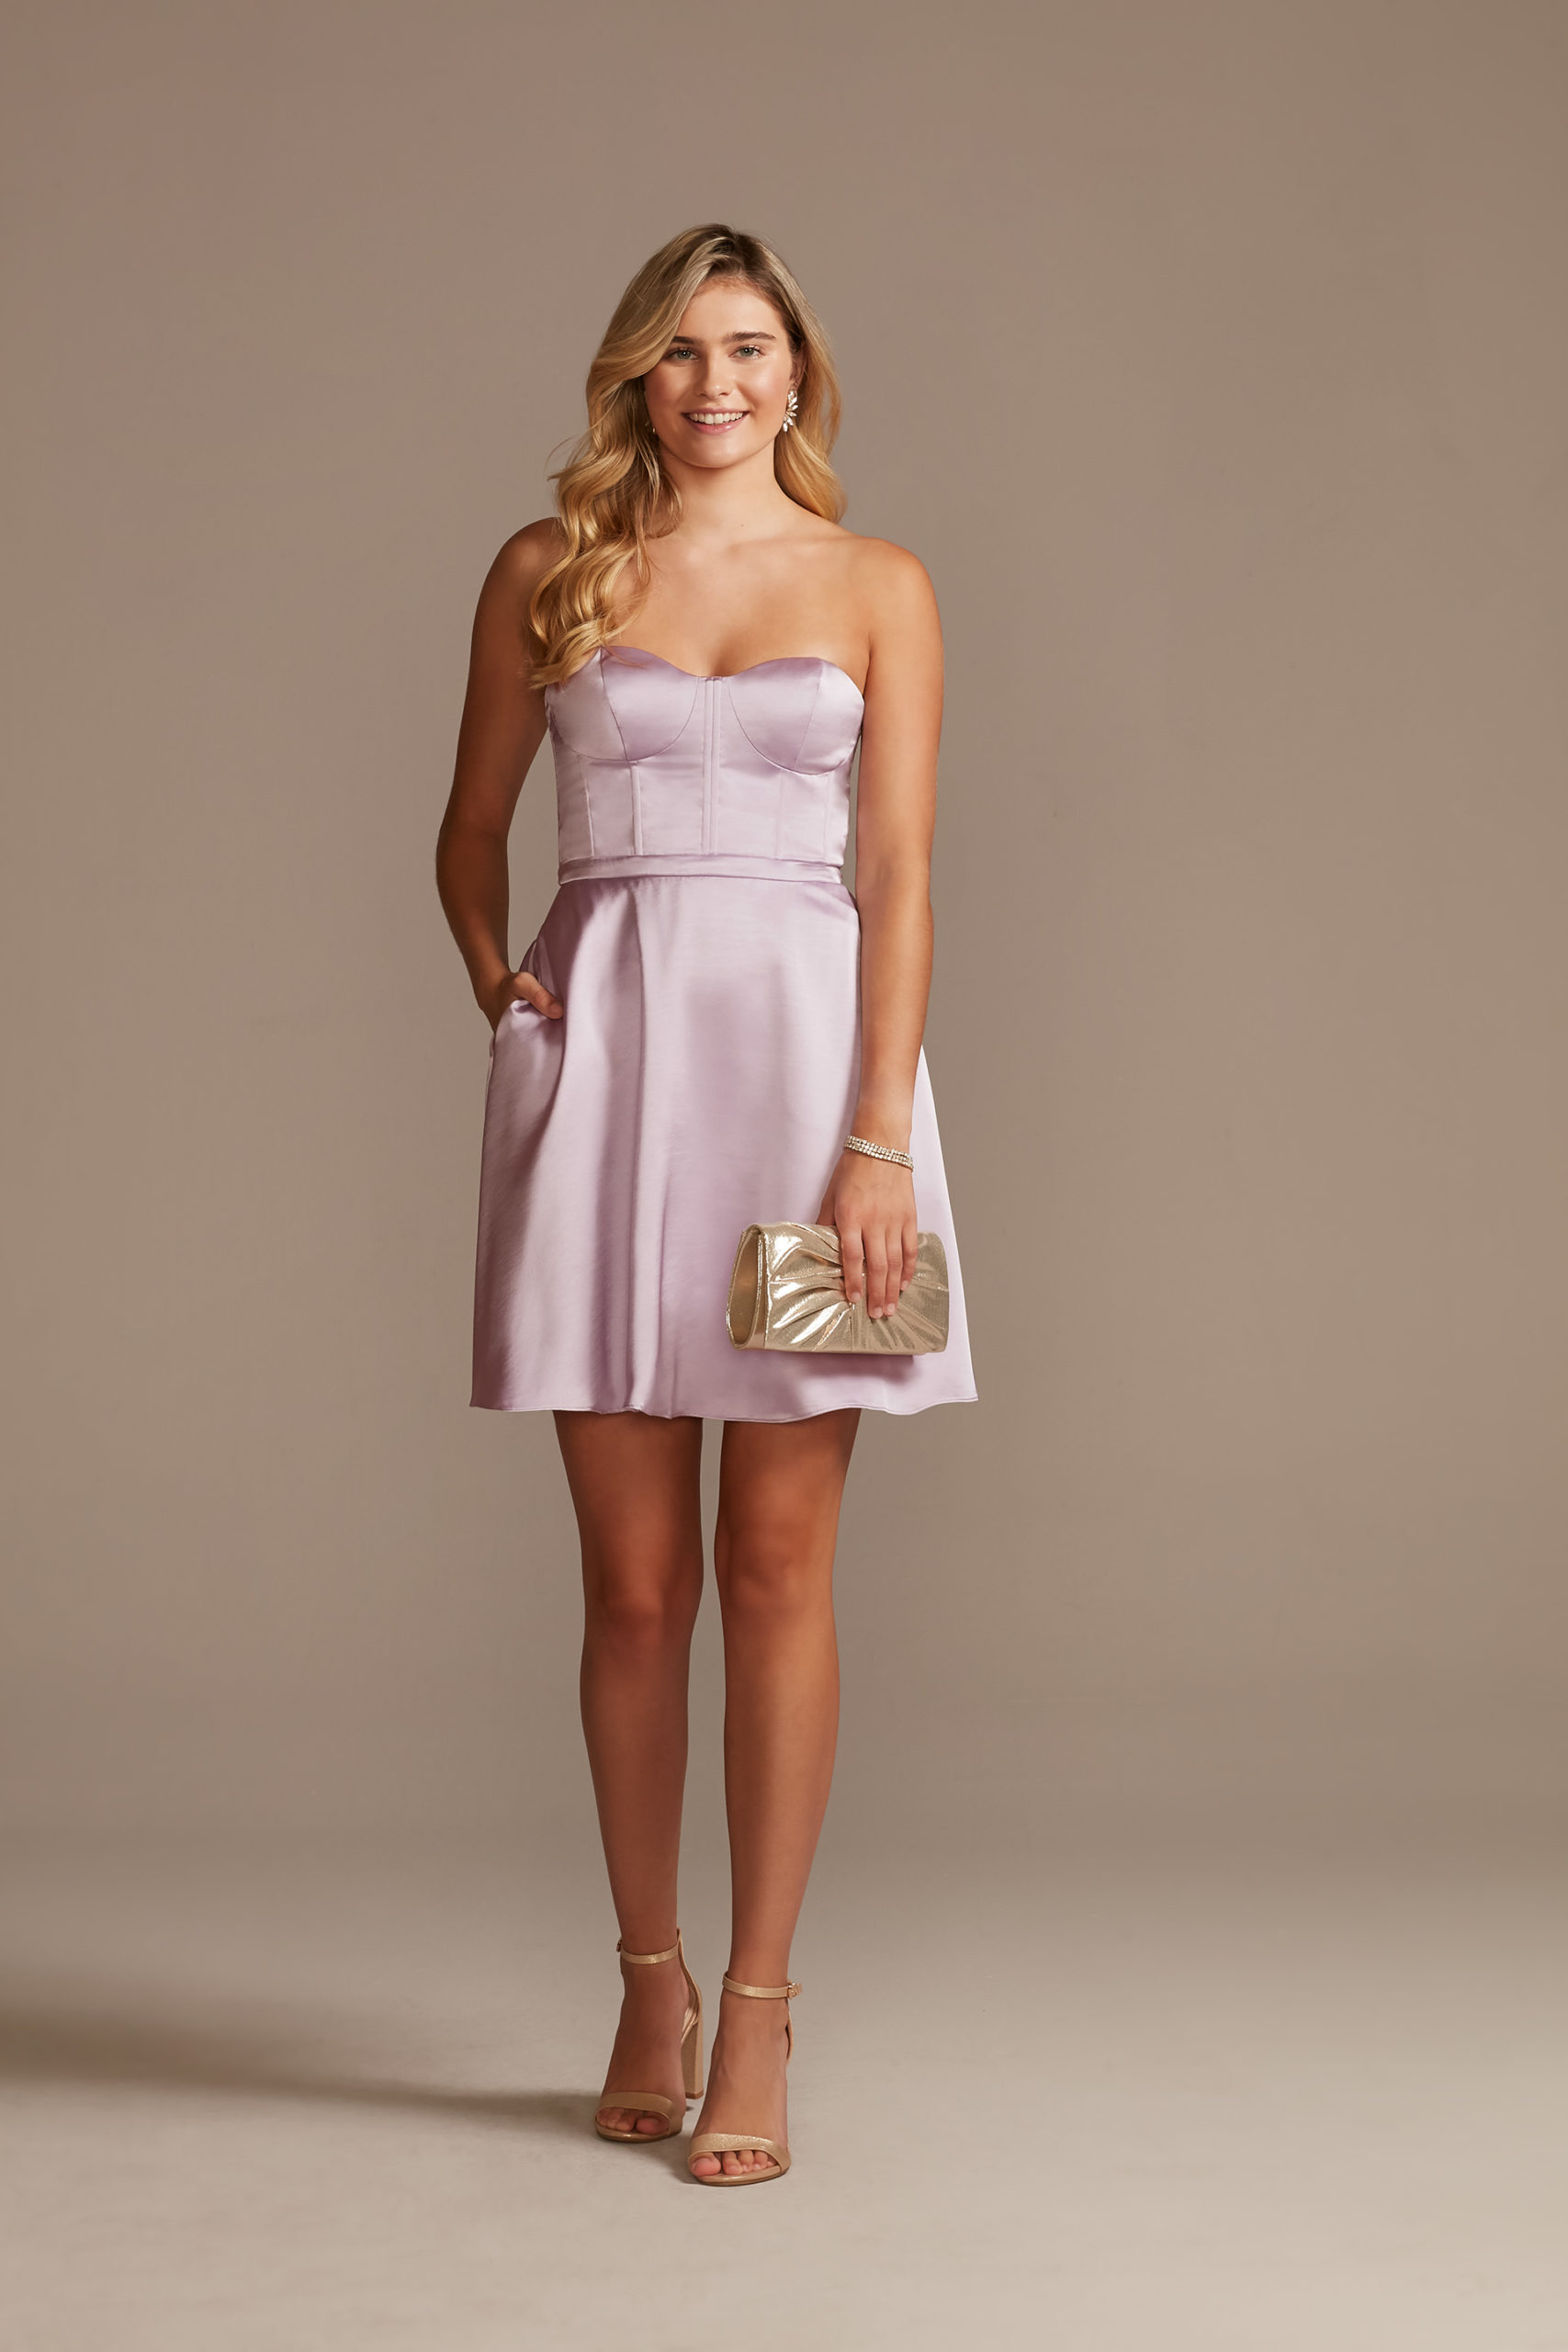 satin purple homecoming dress with corset bodice